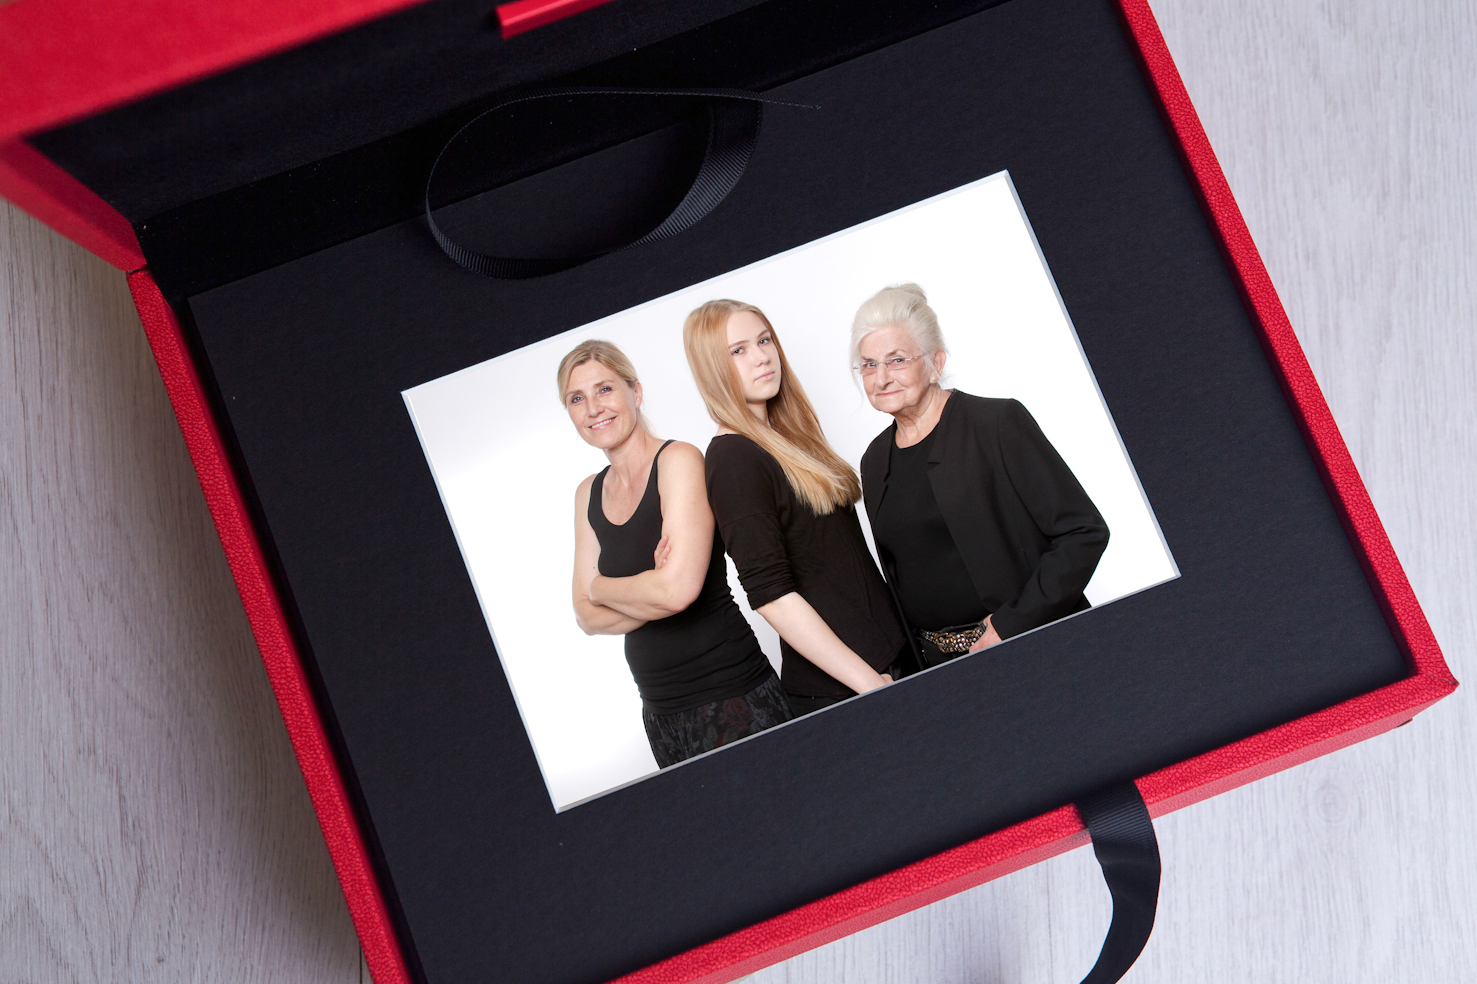 Fotoshooting Memorybox in rot JGA Fotoparty Dortmund Junggesellinnenabschied im Fotostudio